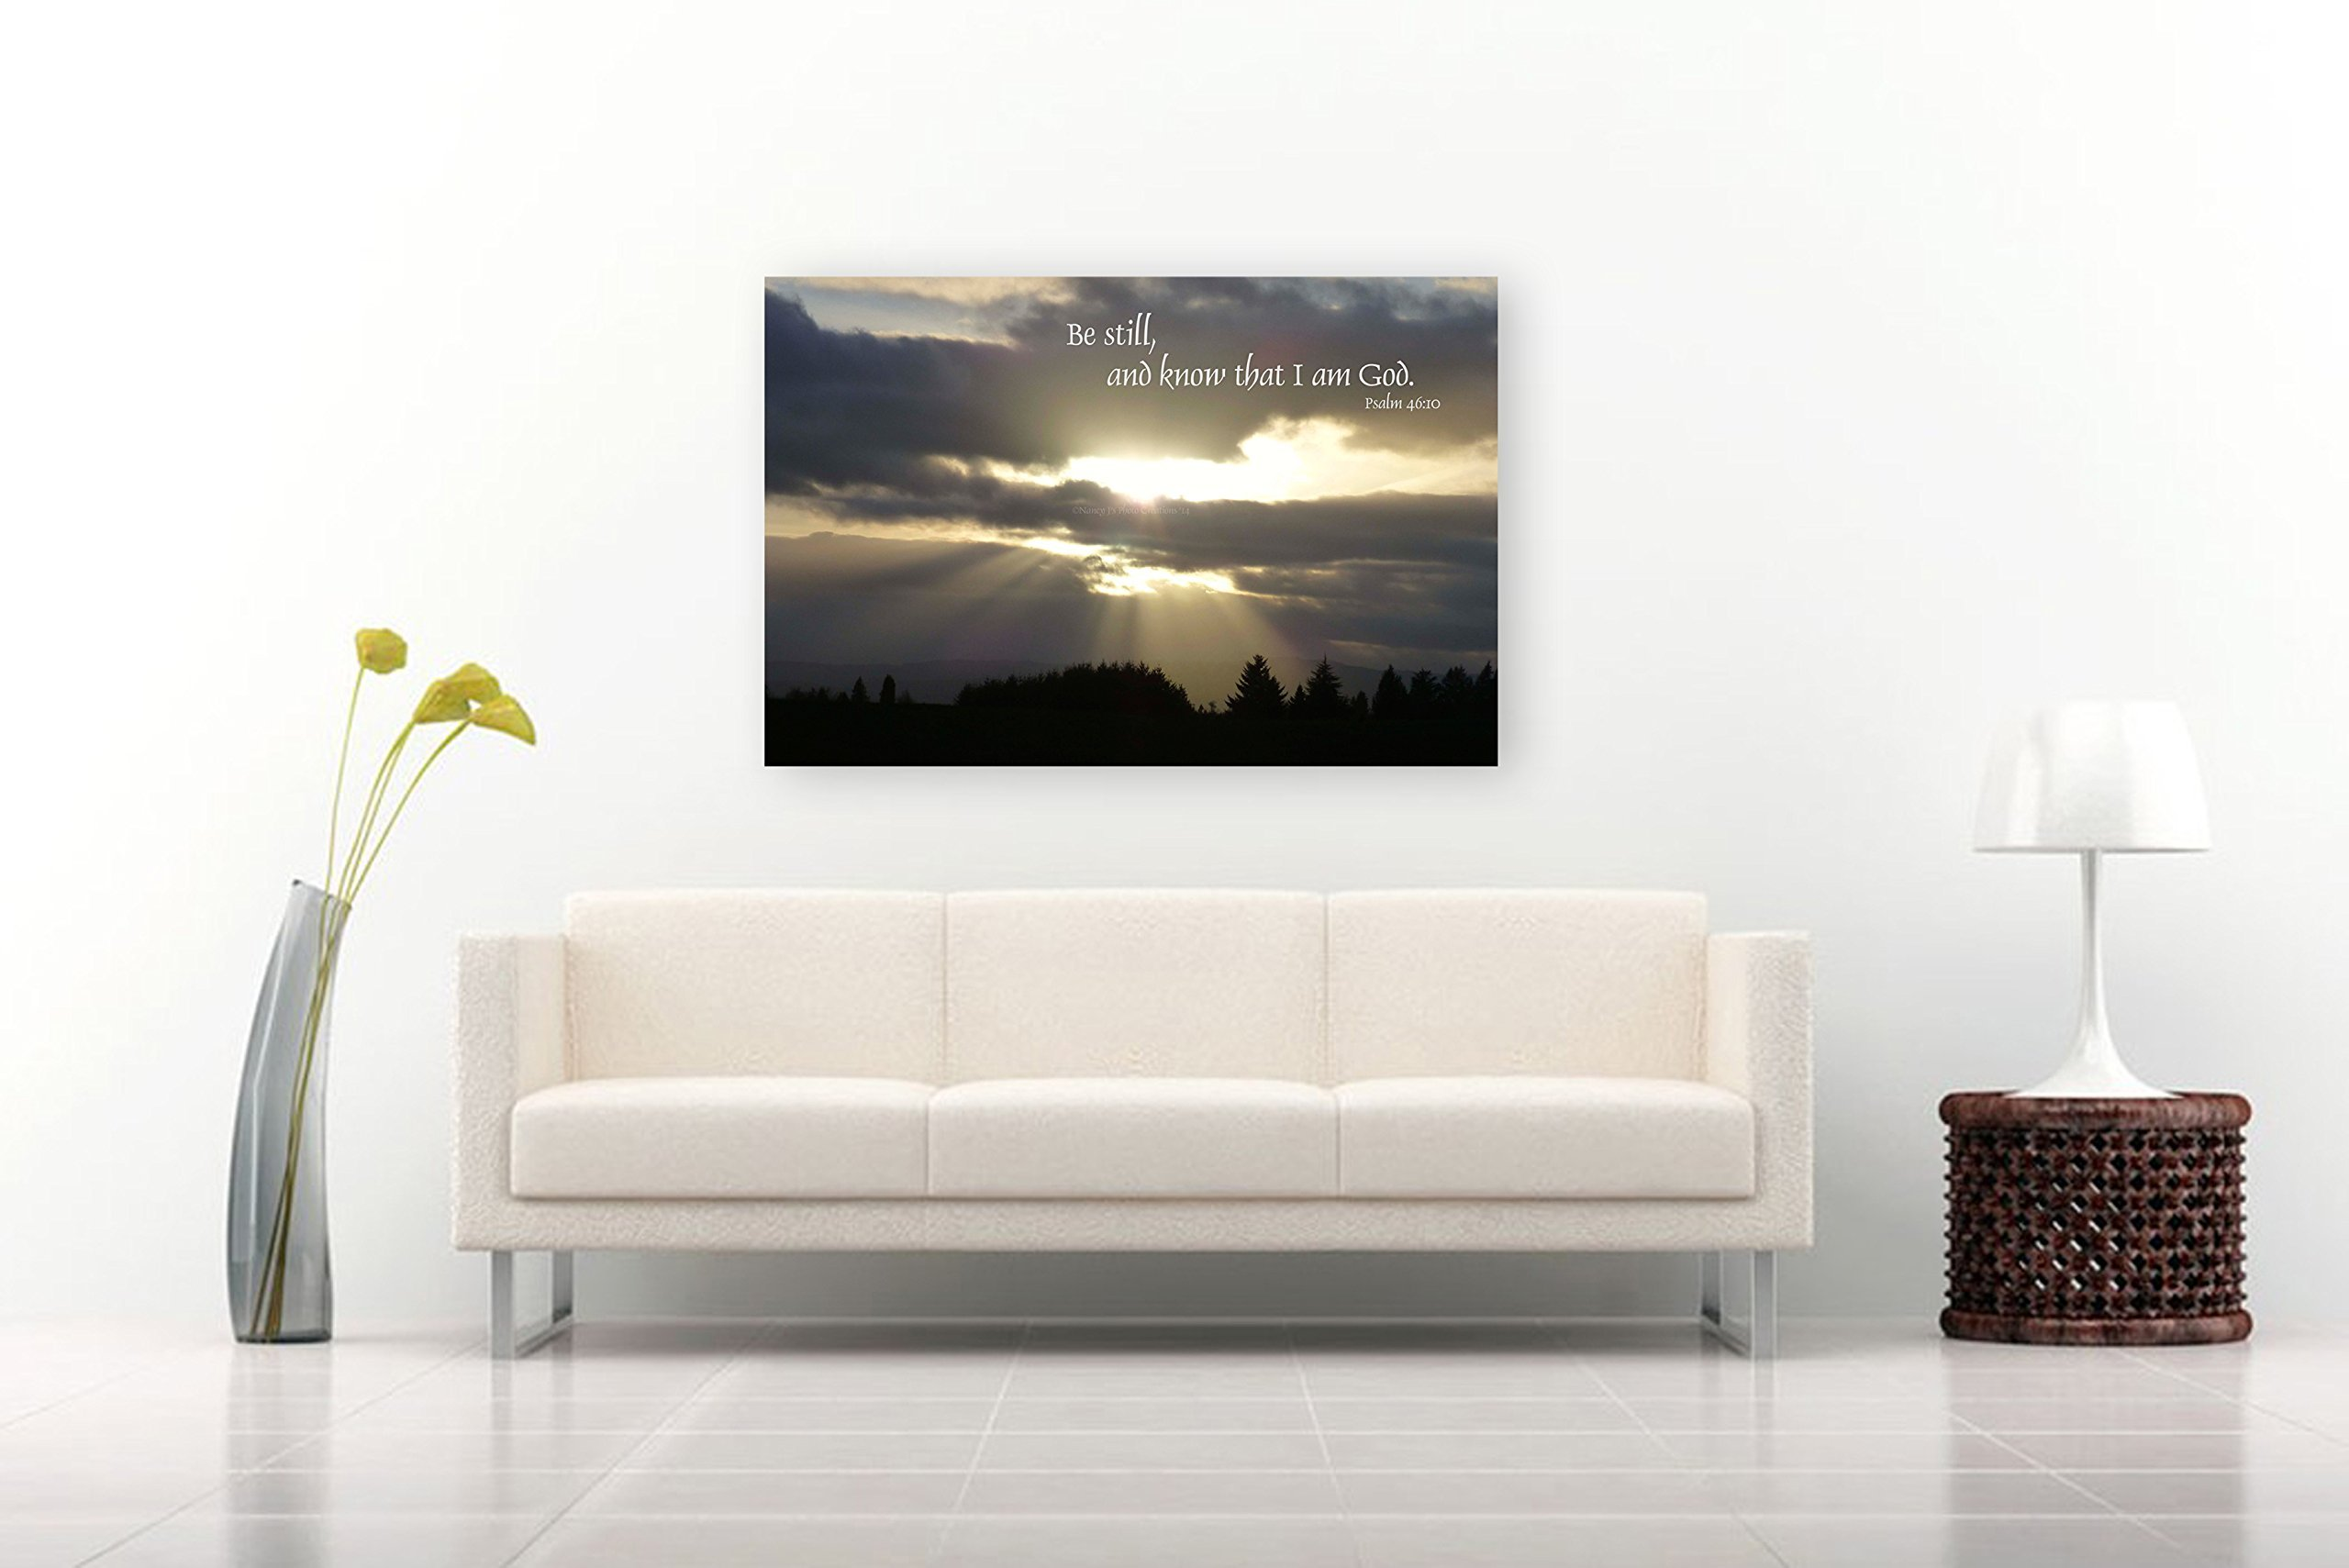 Psalm 46:10 Photographic Print on CANVAS Christian Art Nature Photography Taupe White Black Religious Home Decor Sunburst Sky Landscape Photo Ready to Hang 8x10 8x12 11x14 12x18 16x20 16x24 20x30